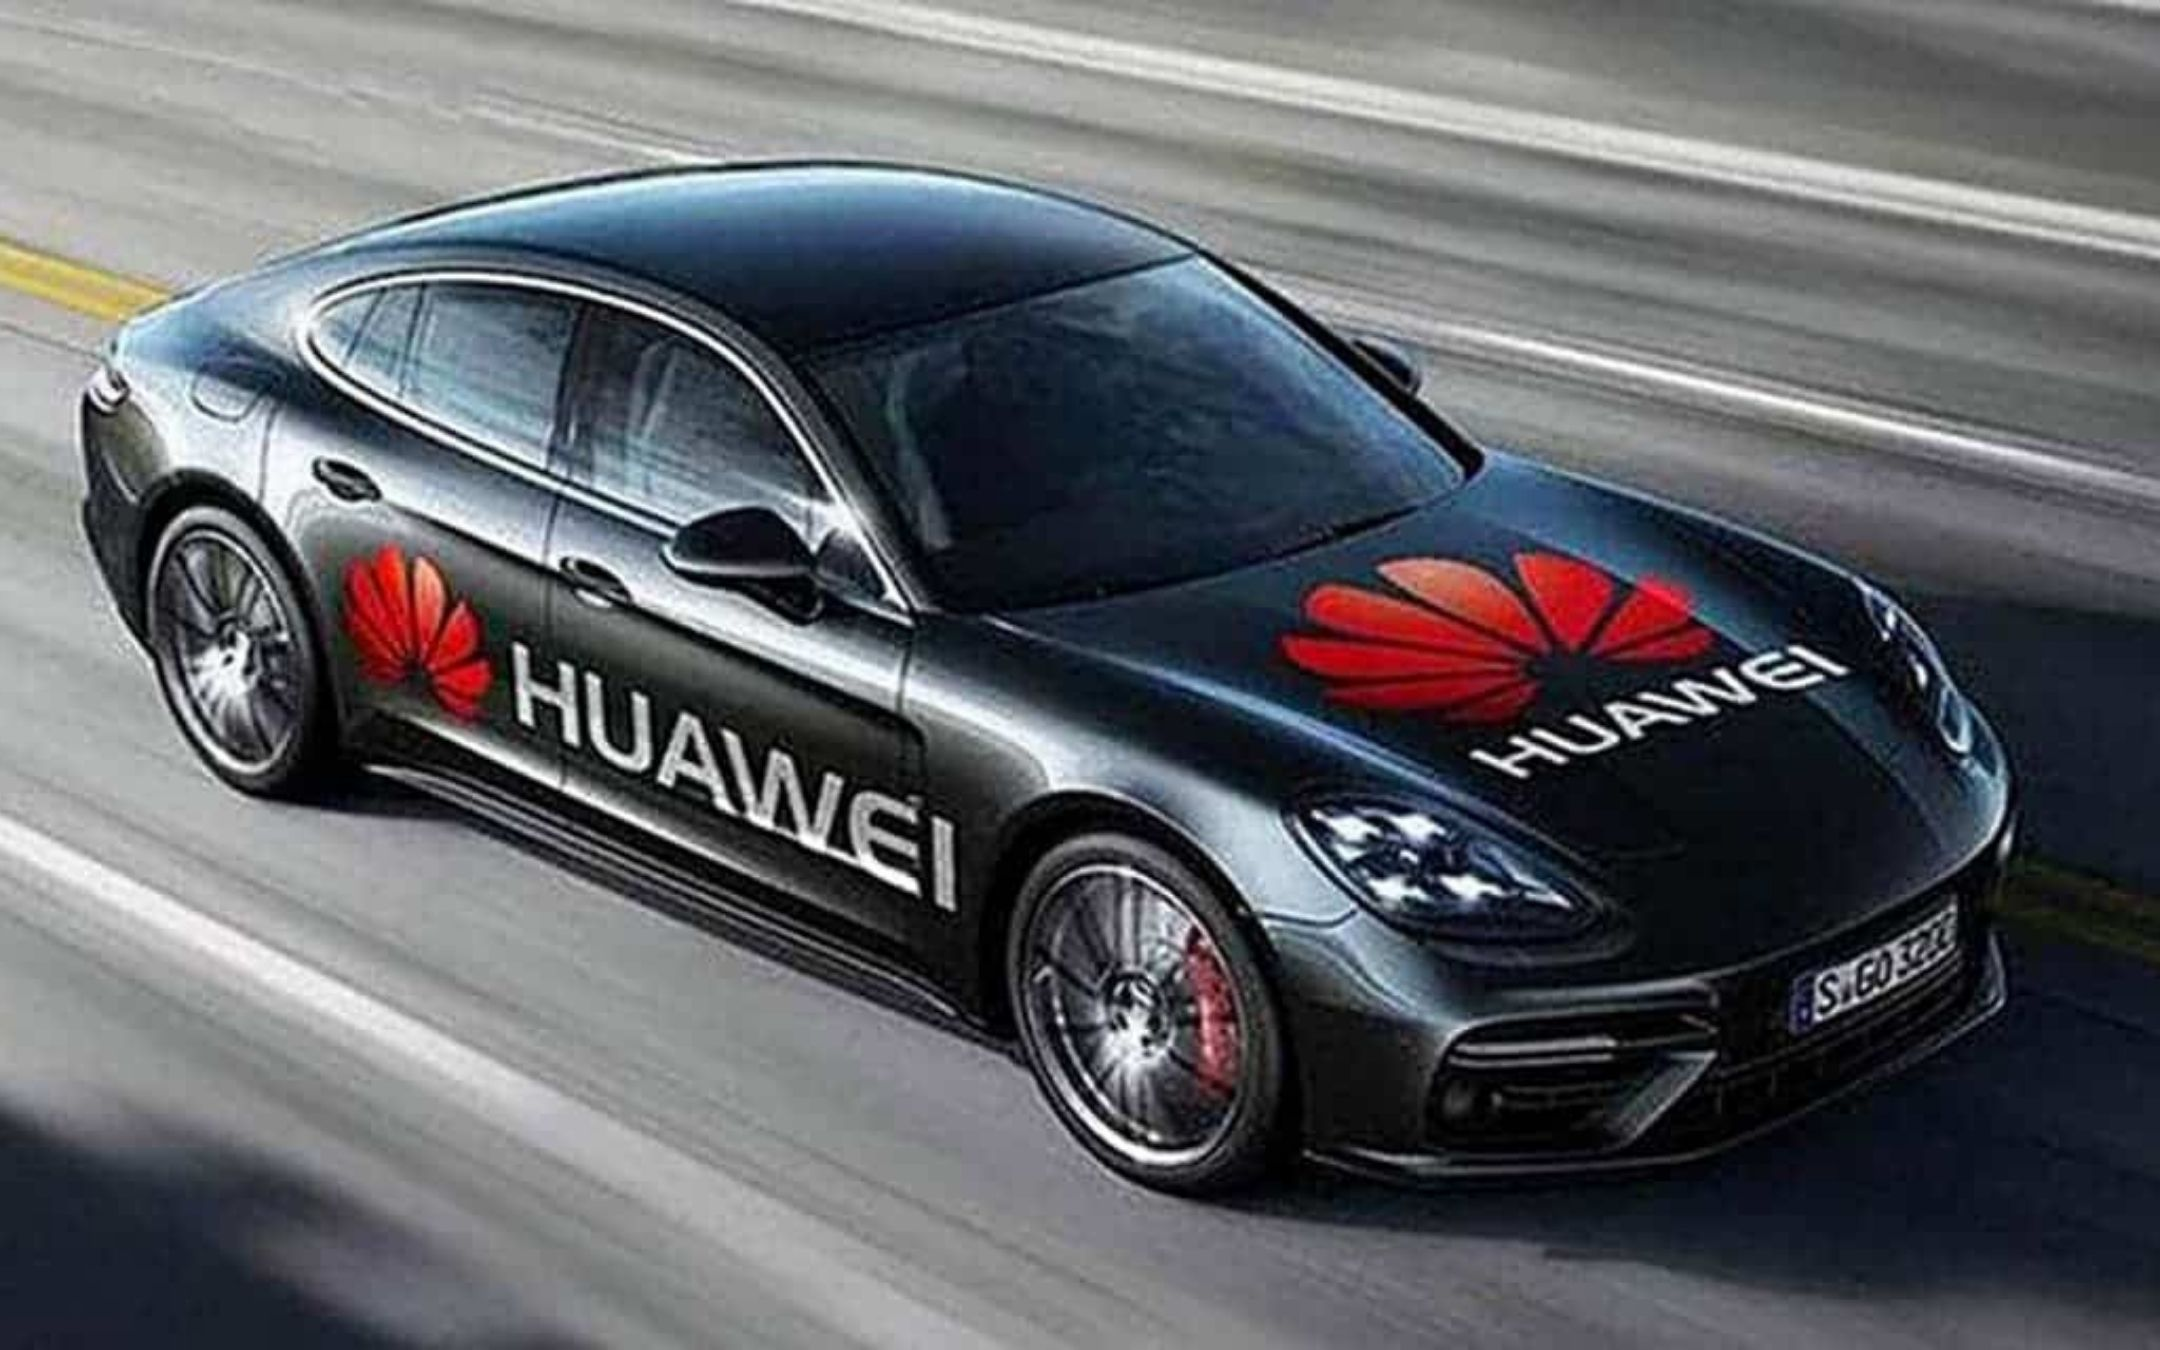 Huawei auto Usa